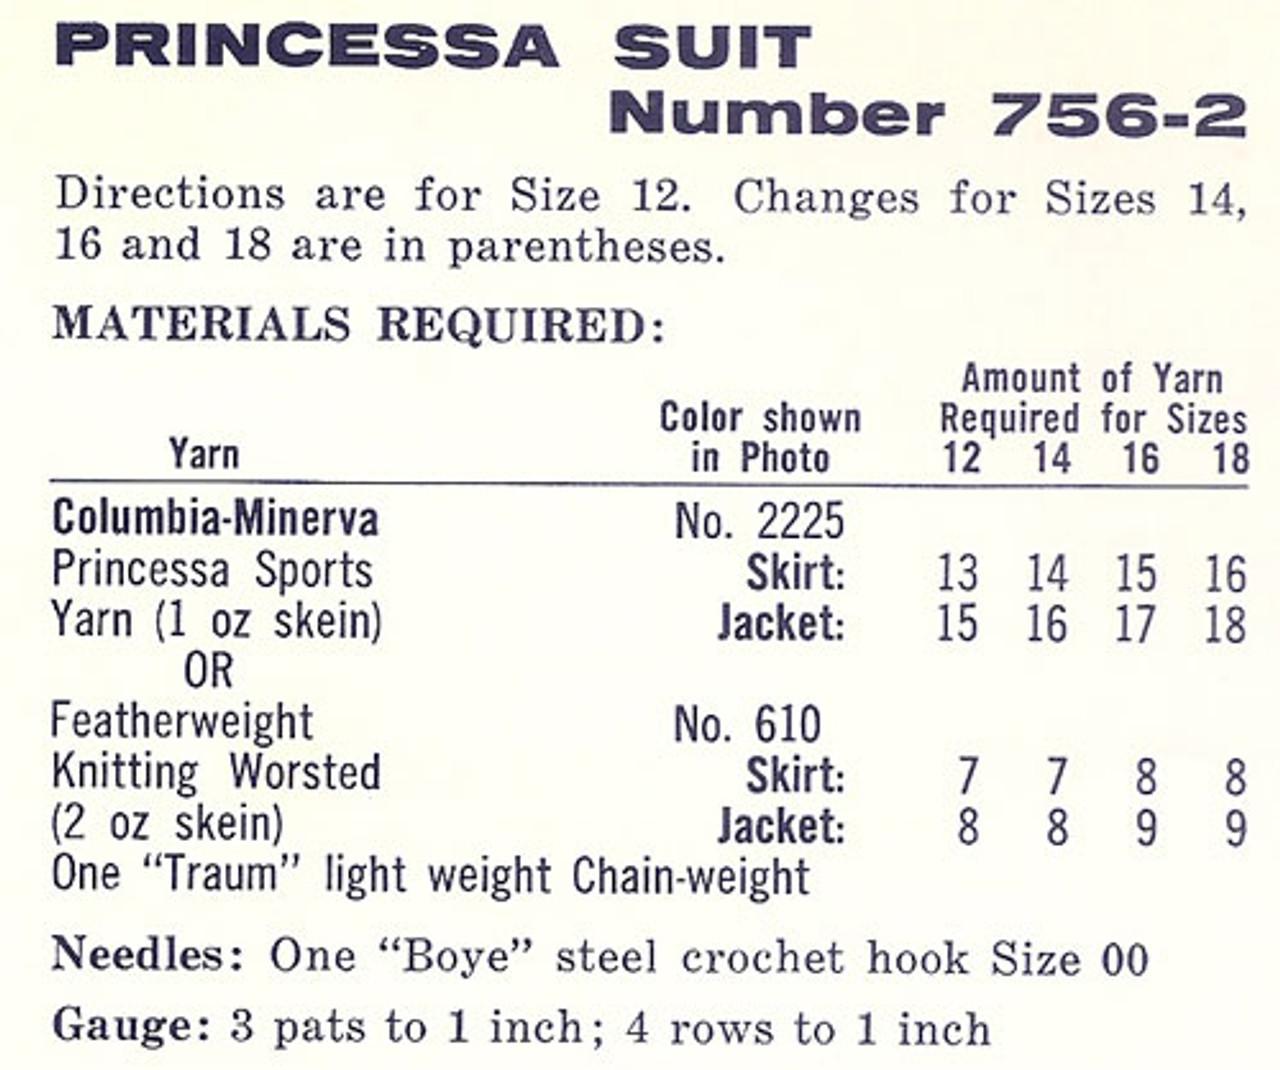 Princess Suit Crochet Material Requirements